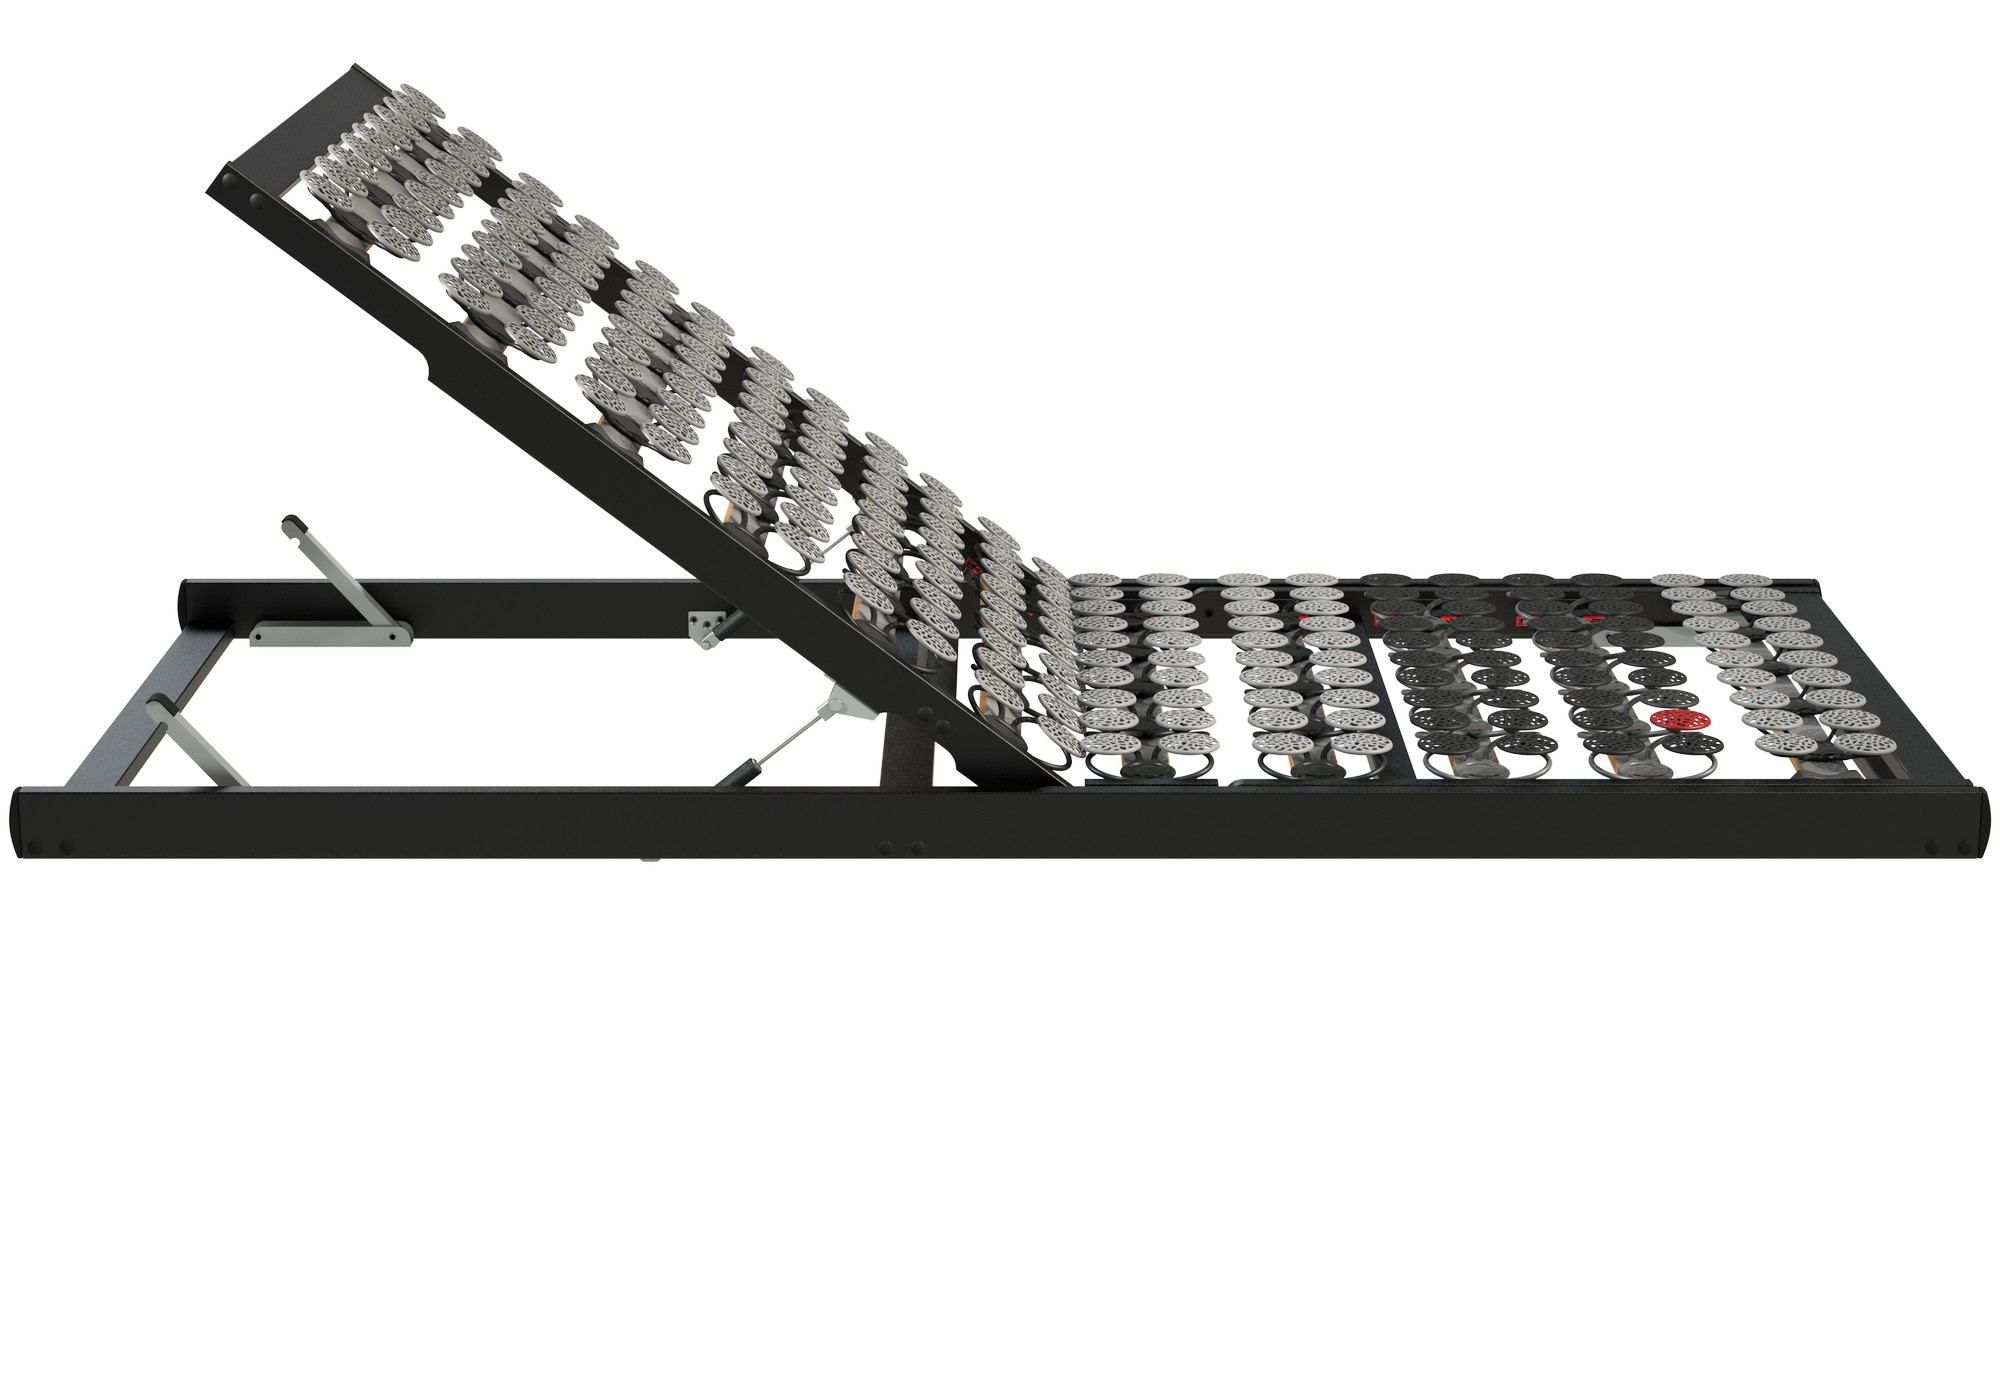 Grosana Airflex SENSITIVE KF Komfort Unterfederung - Kopfteilhöhe 2